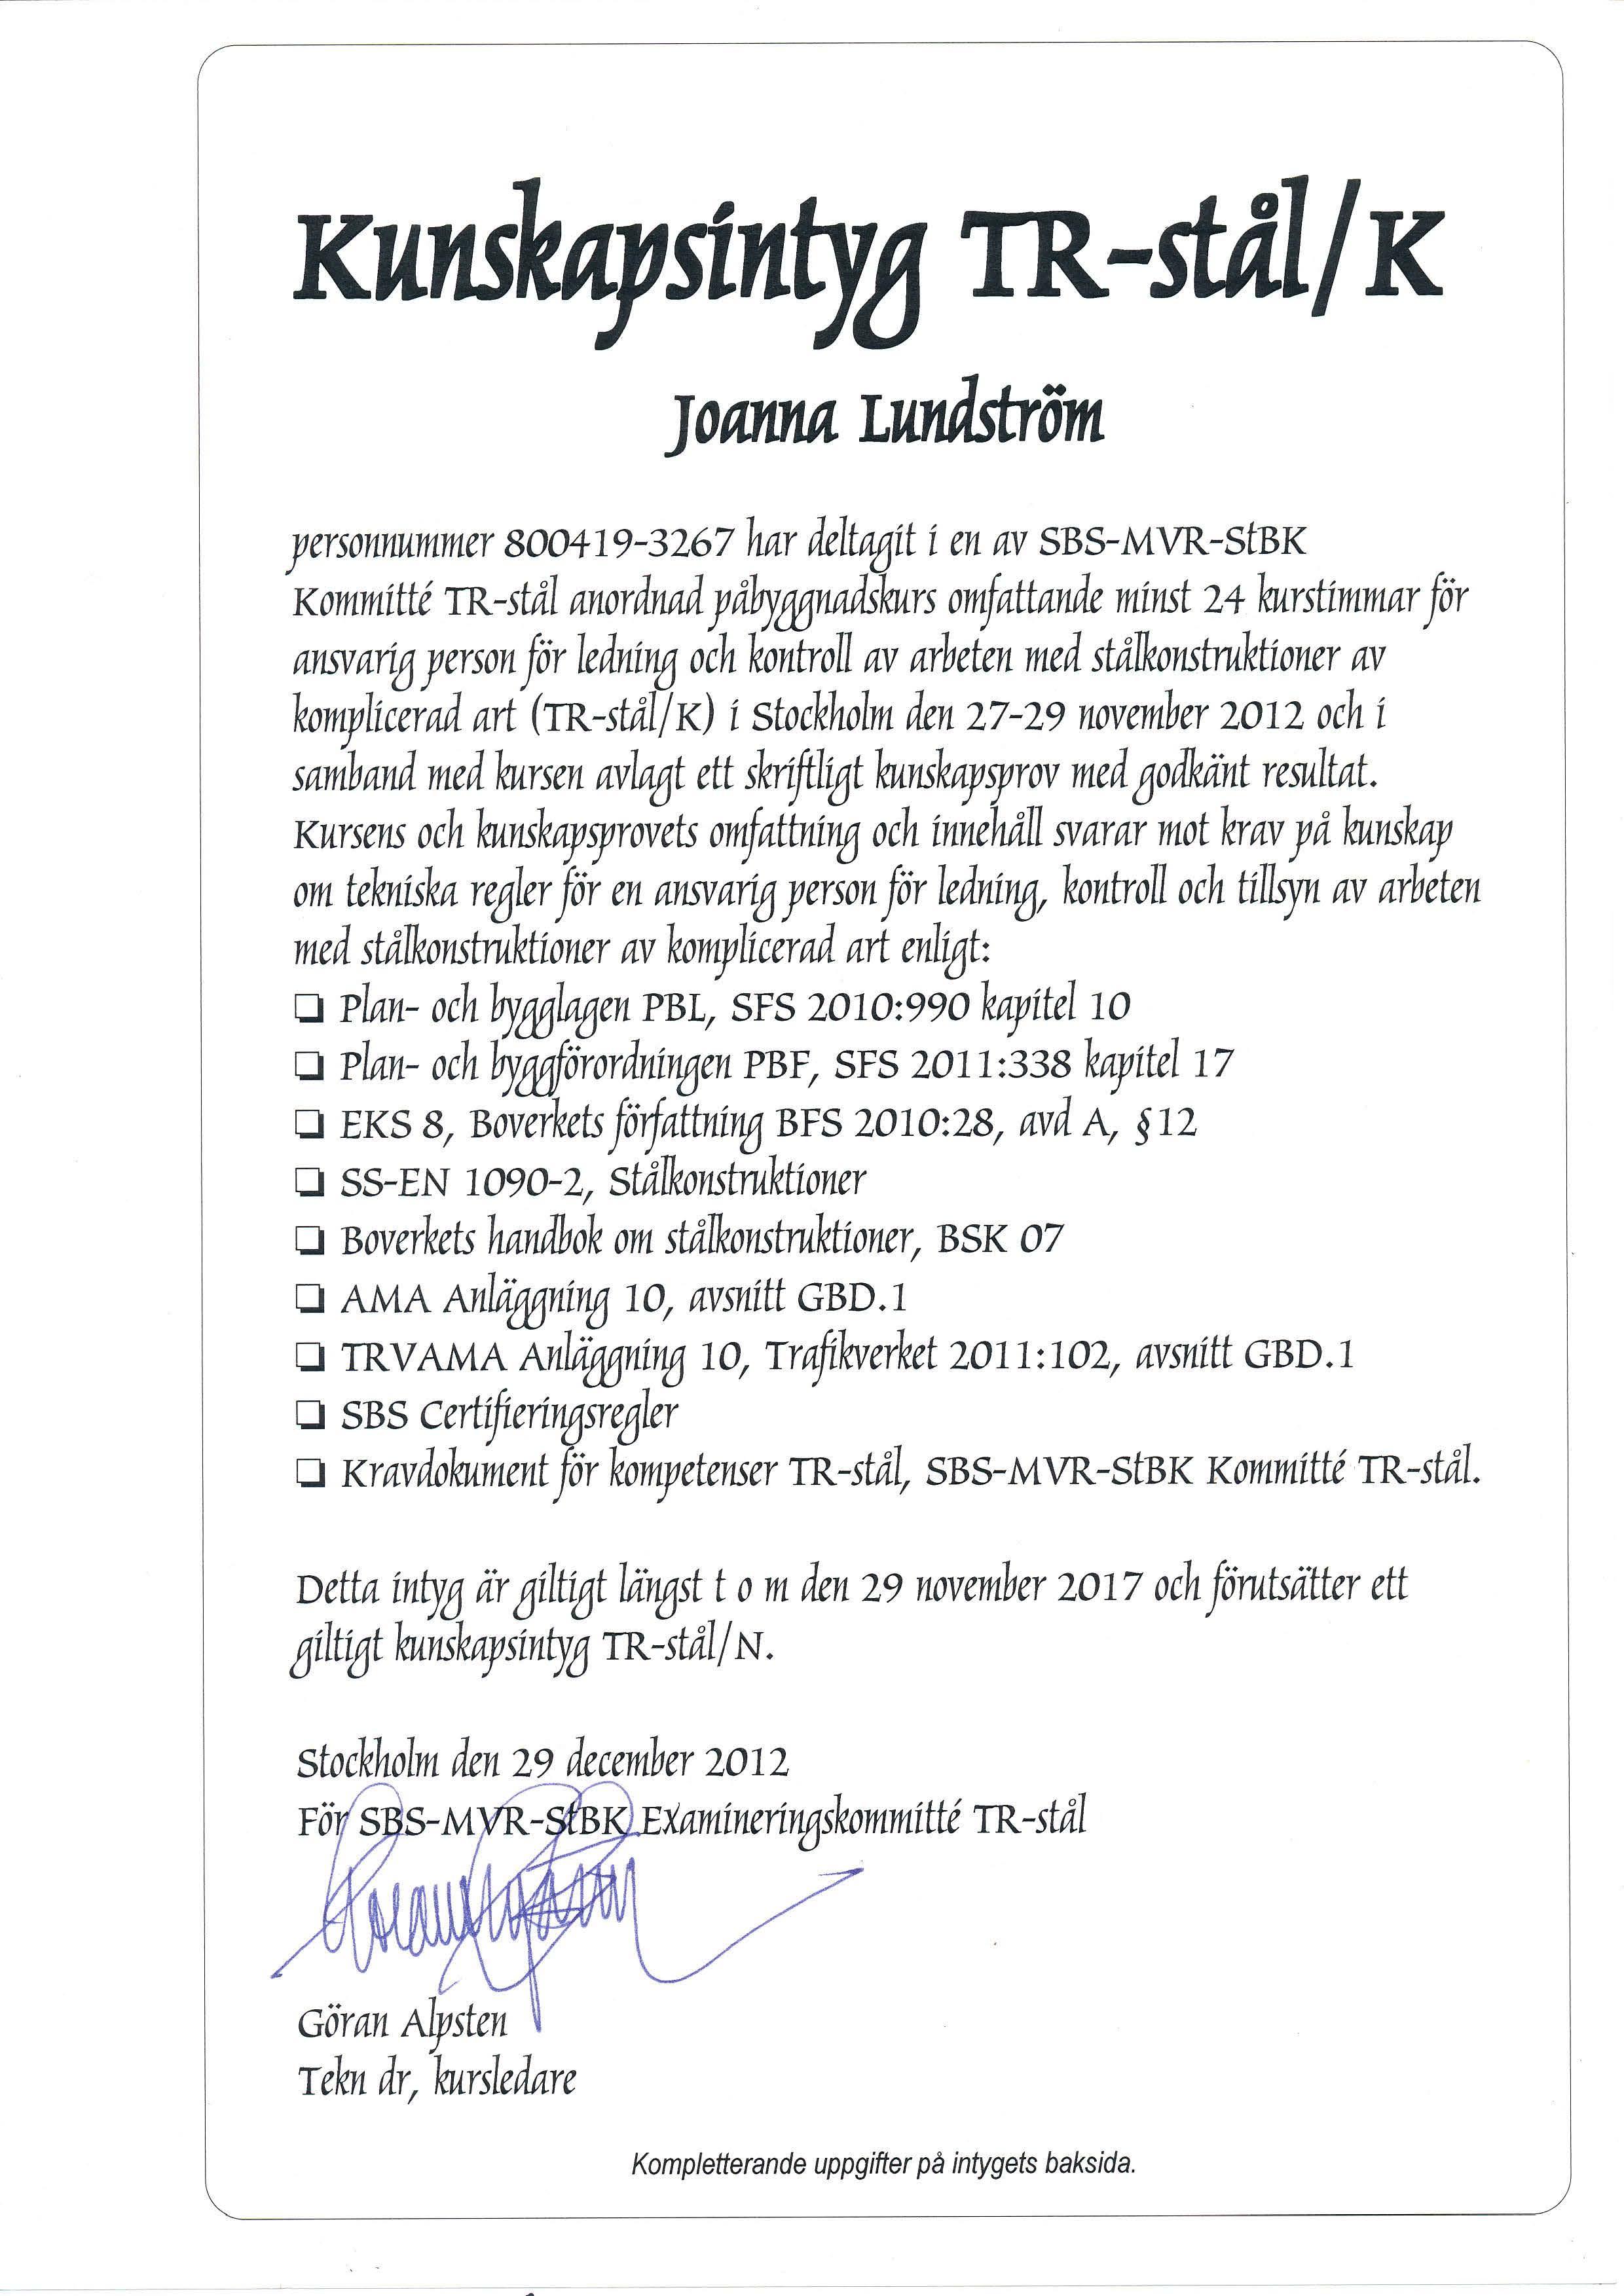 TR-stal K Joanna